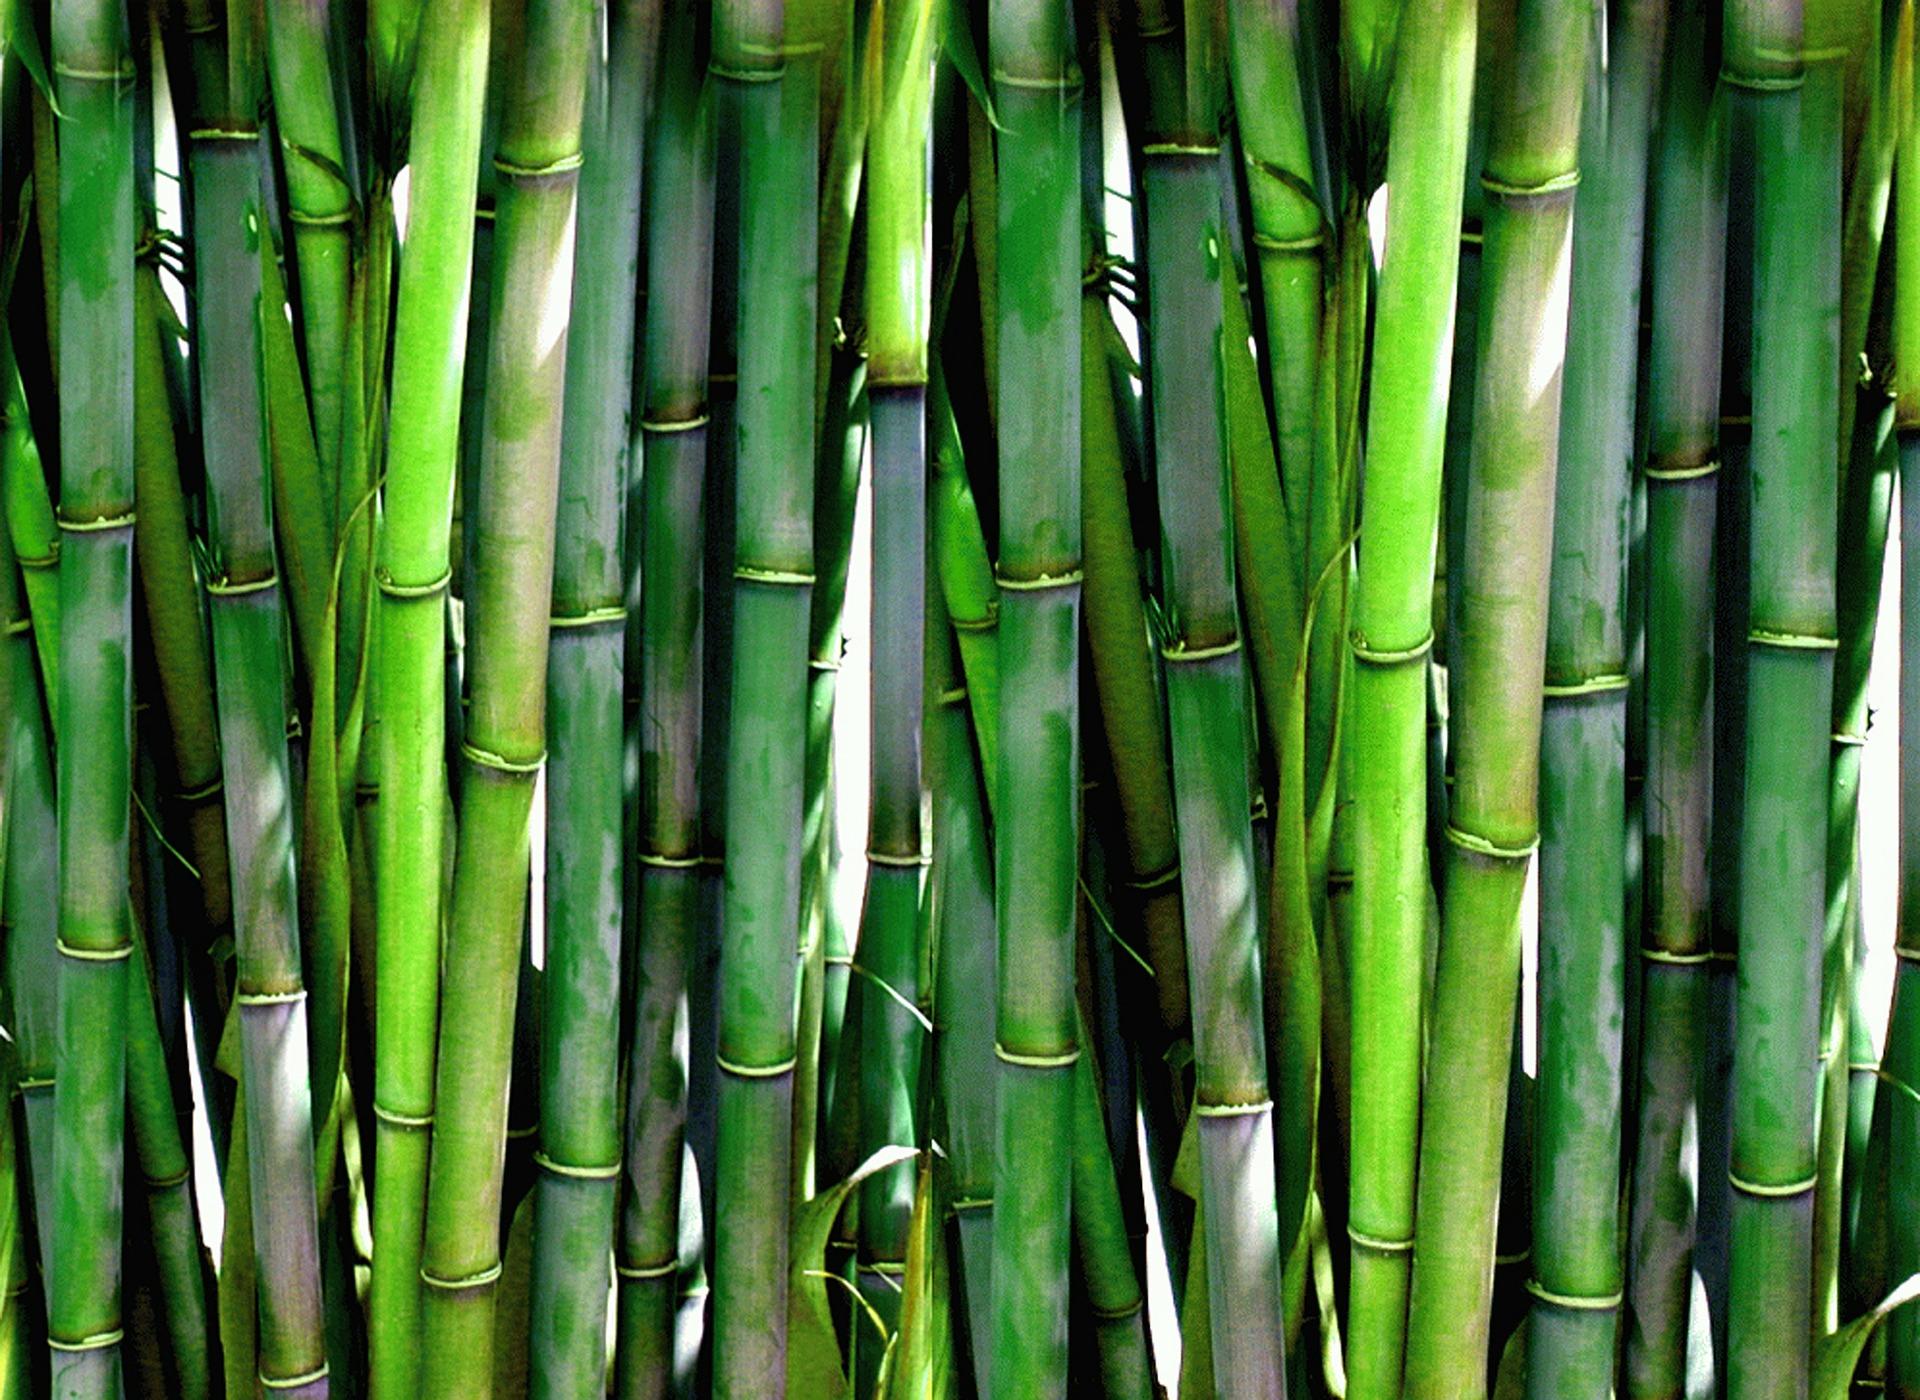 bamboo-20936_1920